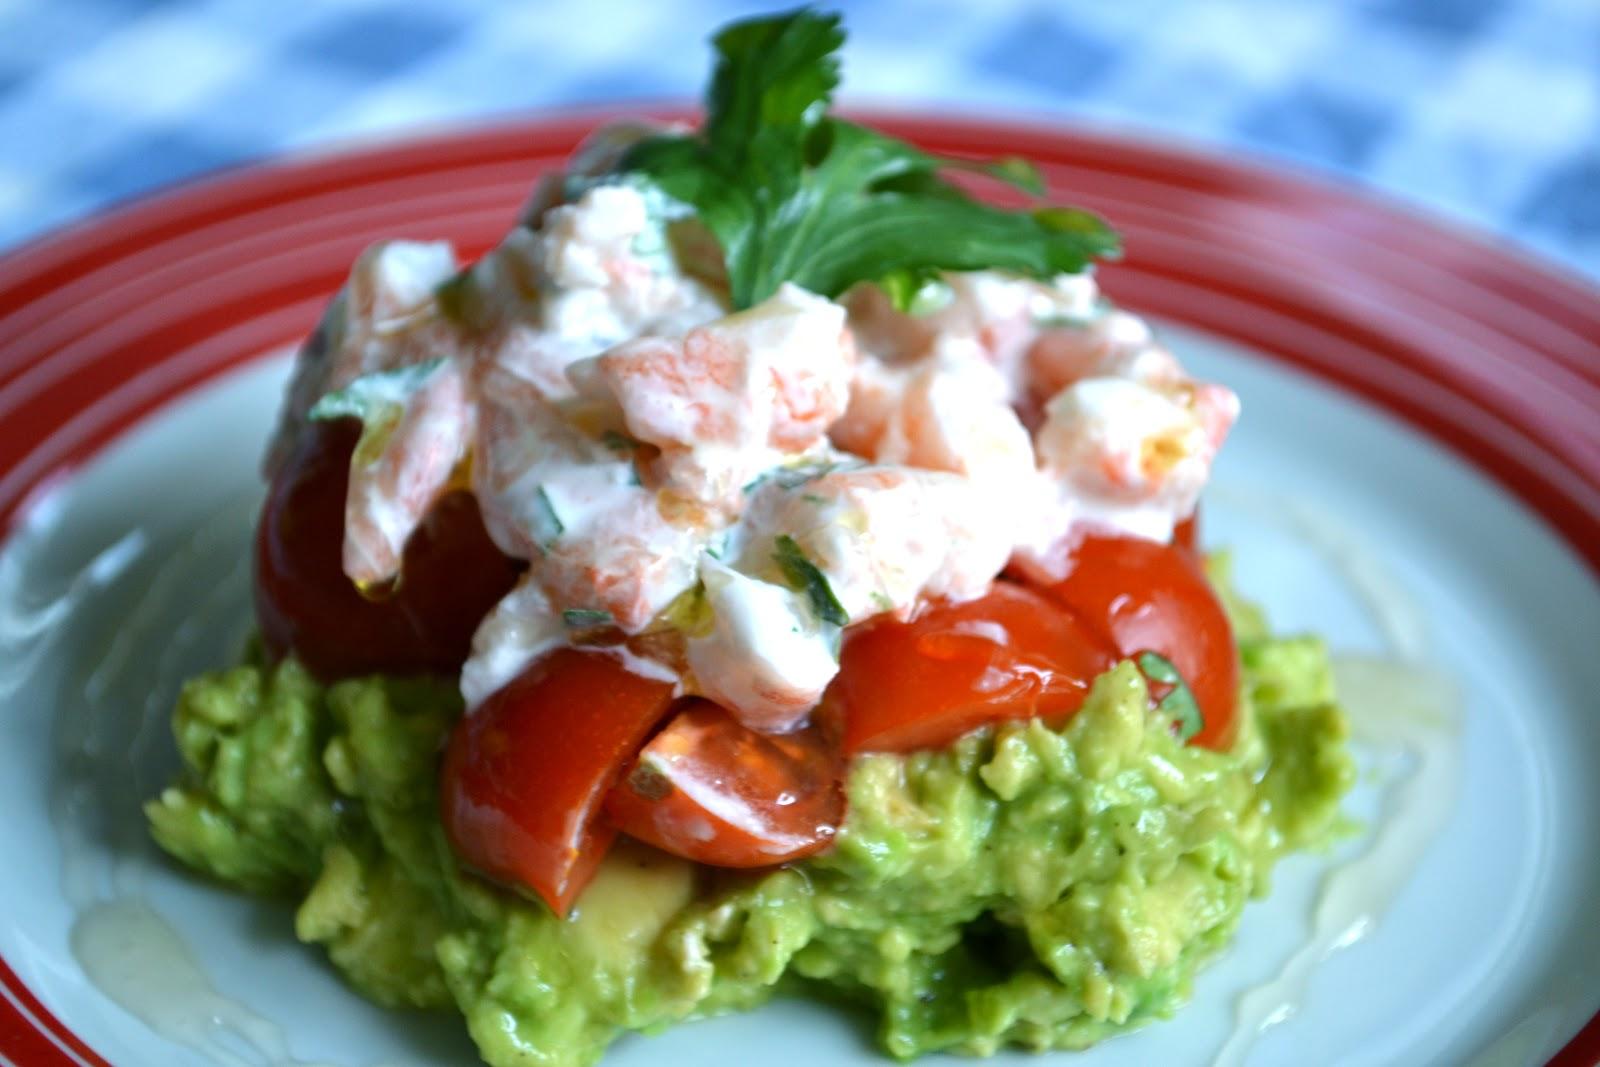 Light And Fresh Avocado Cream Verrines Recipes — Dishmaps